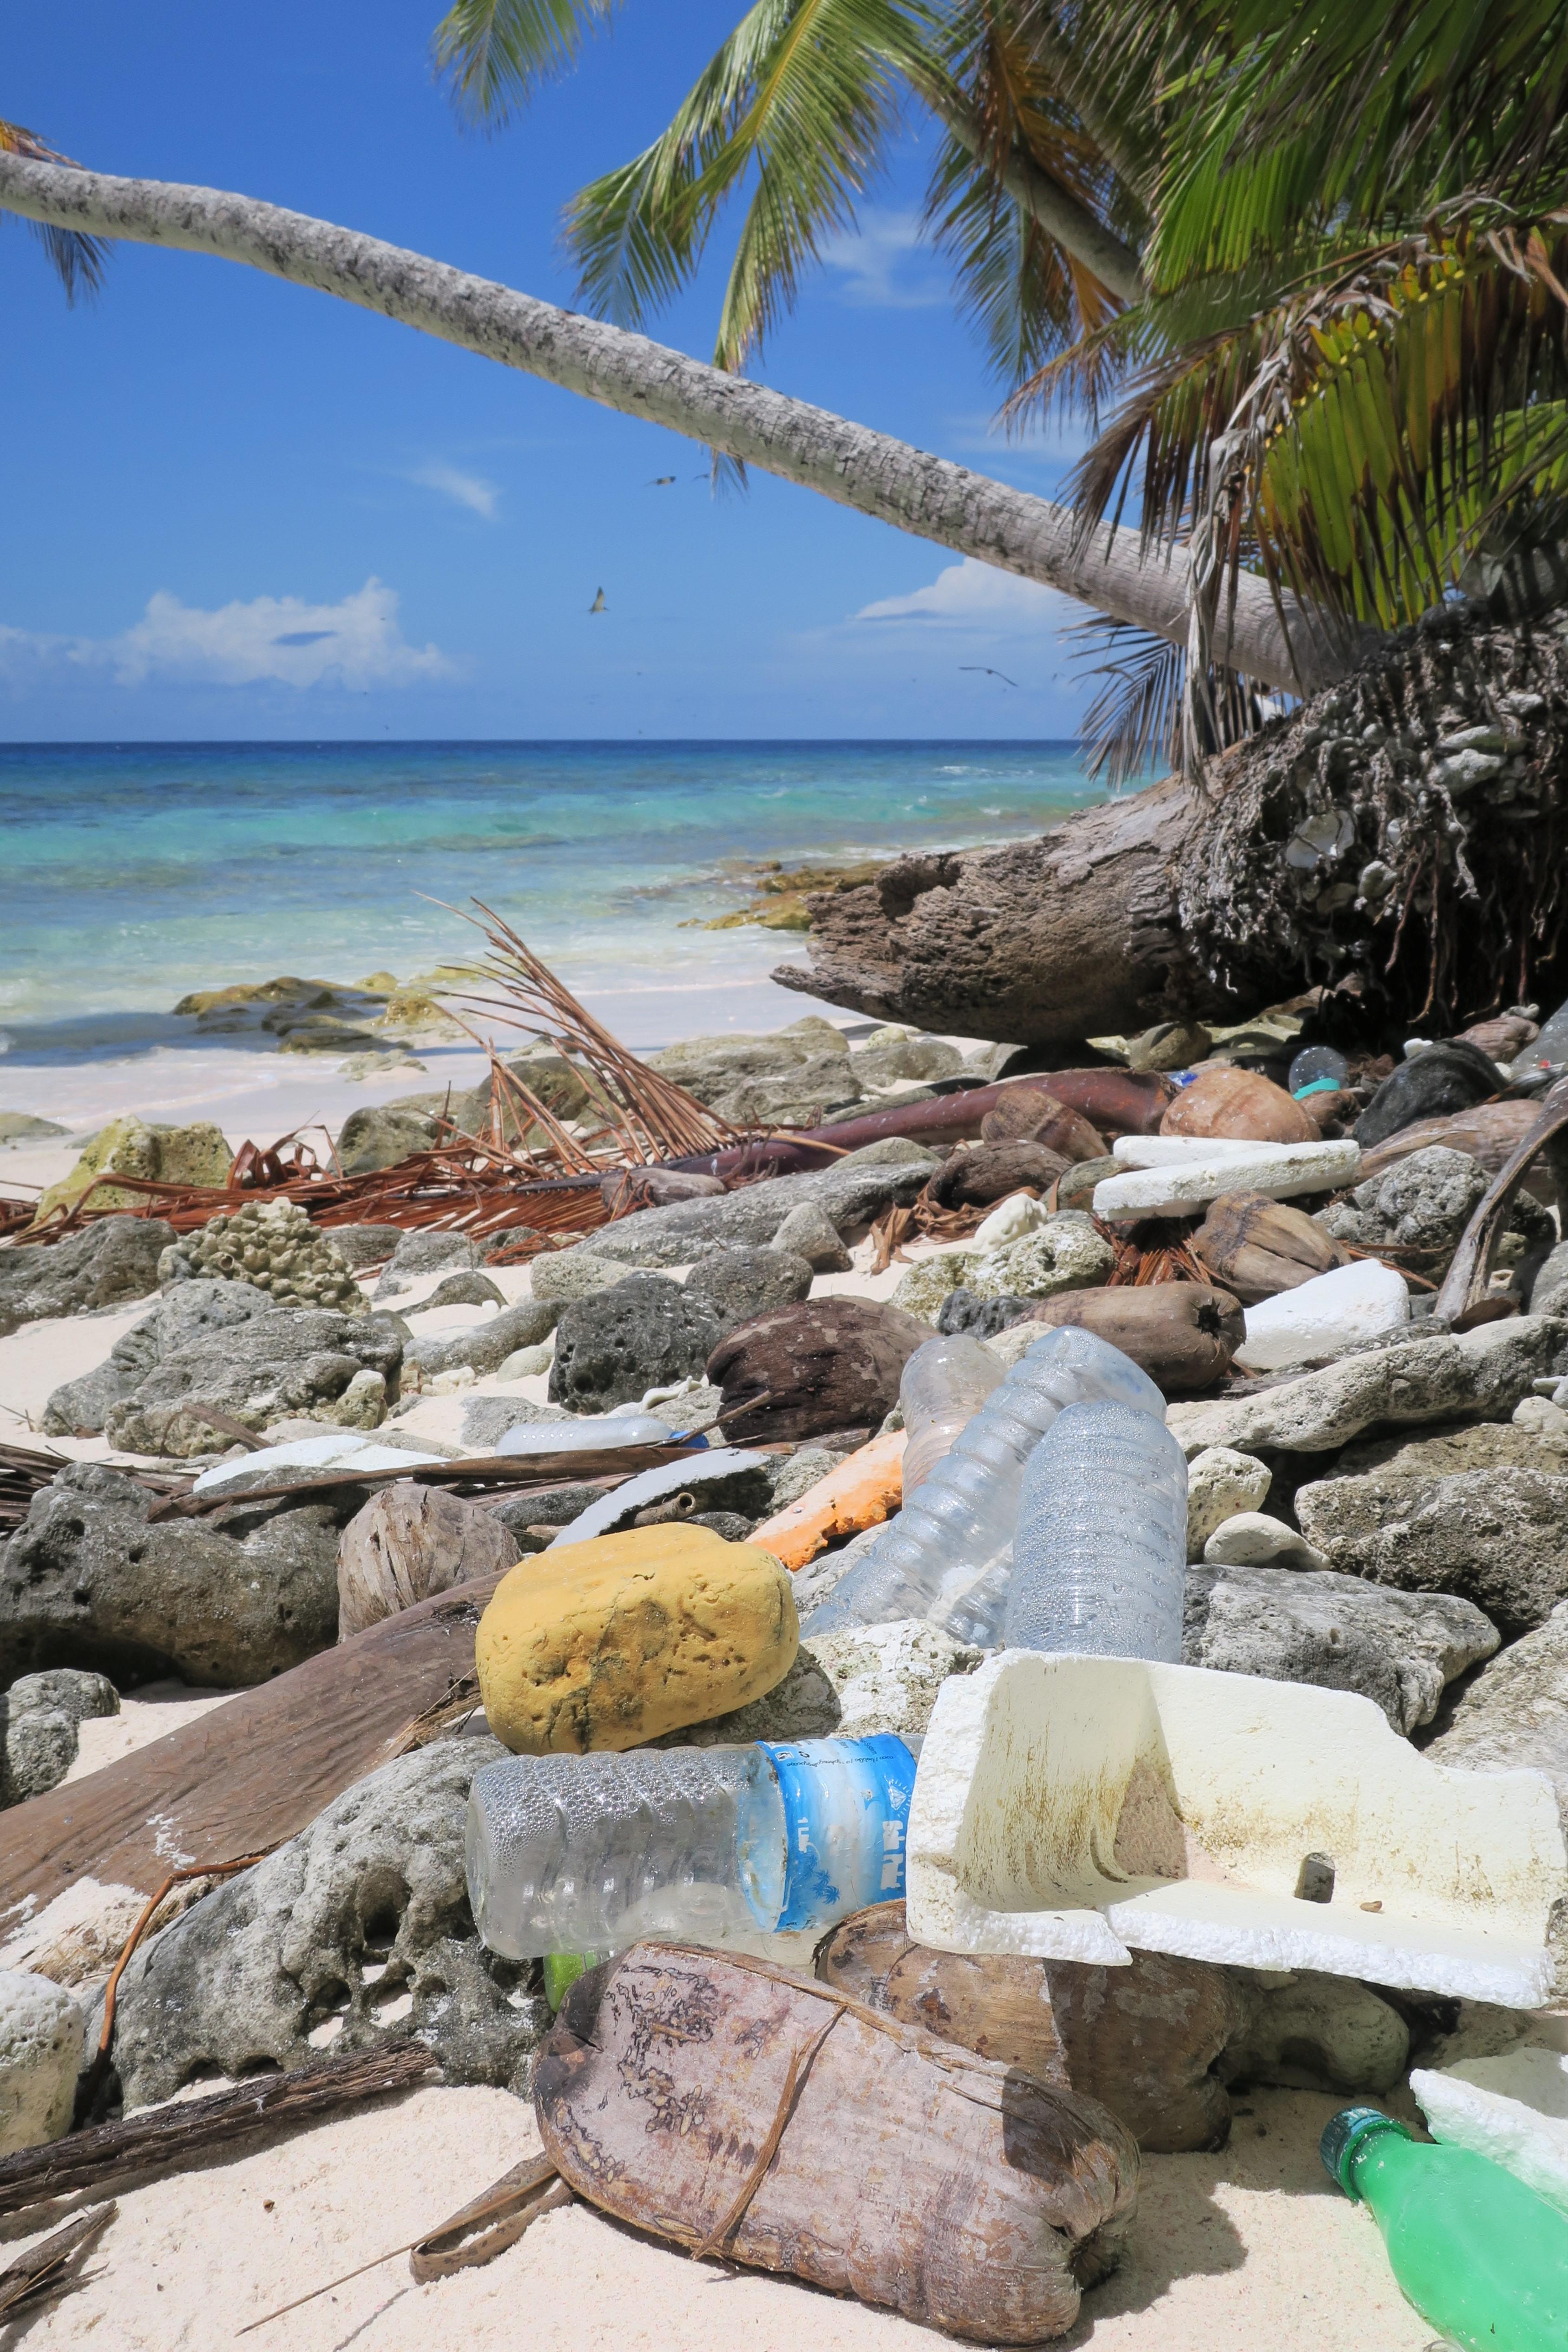 BIOT DPLUS090 Marine debris washed ashore on Ile Parasol beach on Peros Banhos Atoll, Credit - Dan Bayley